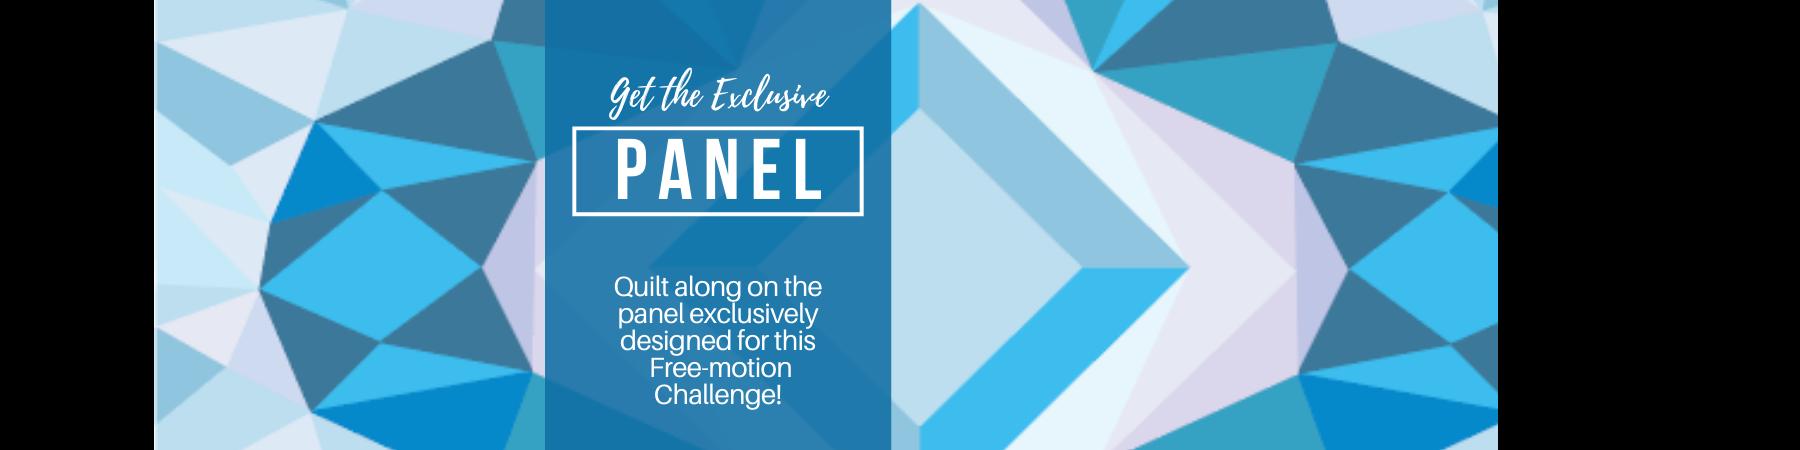 fmq challenge panel